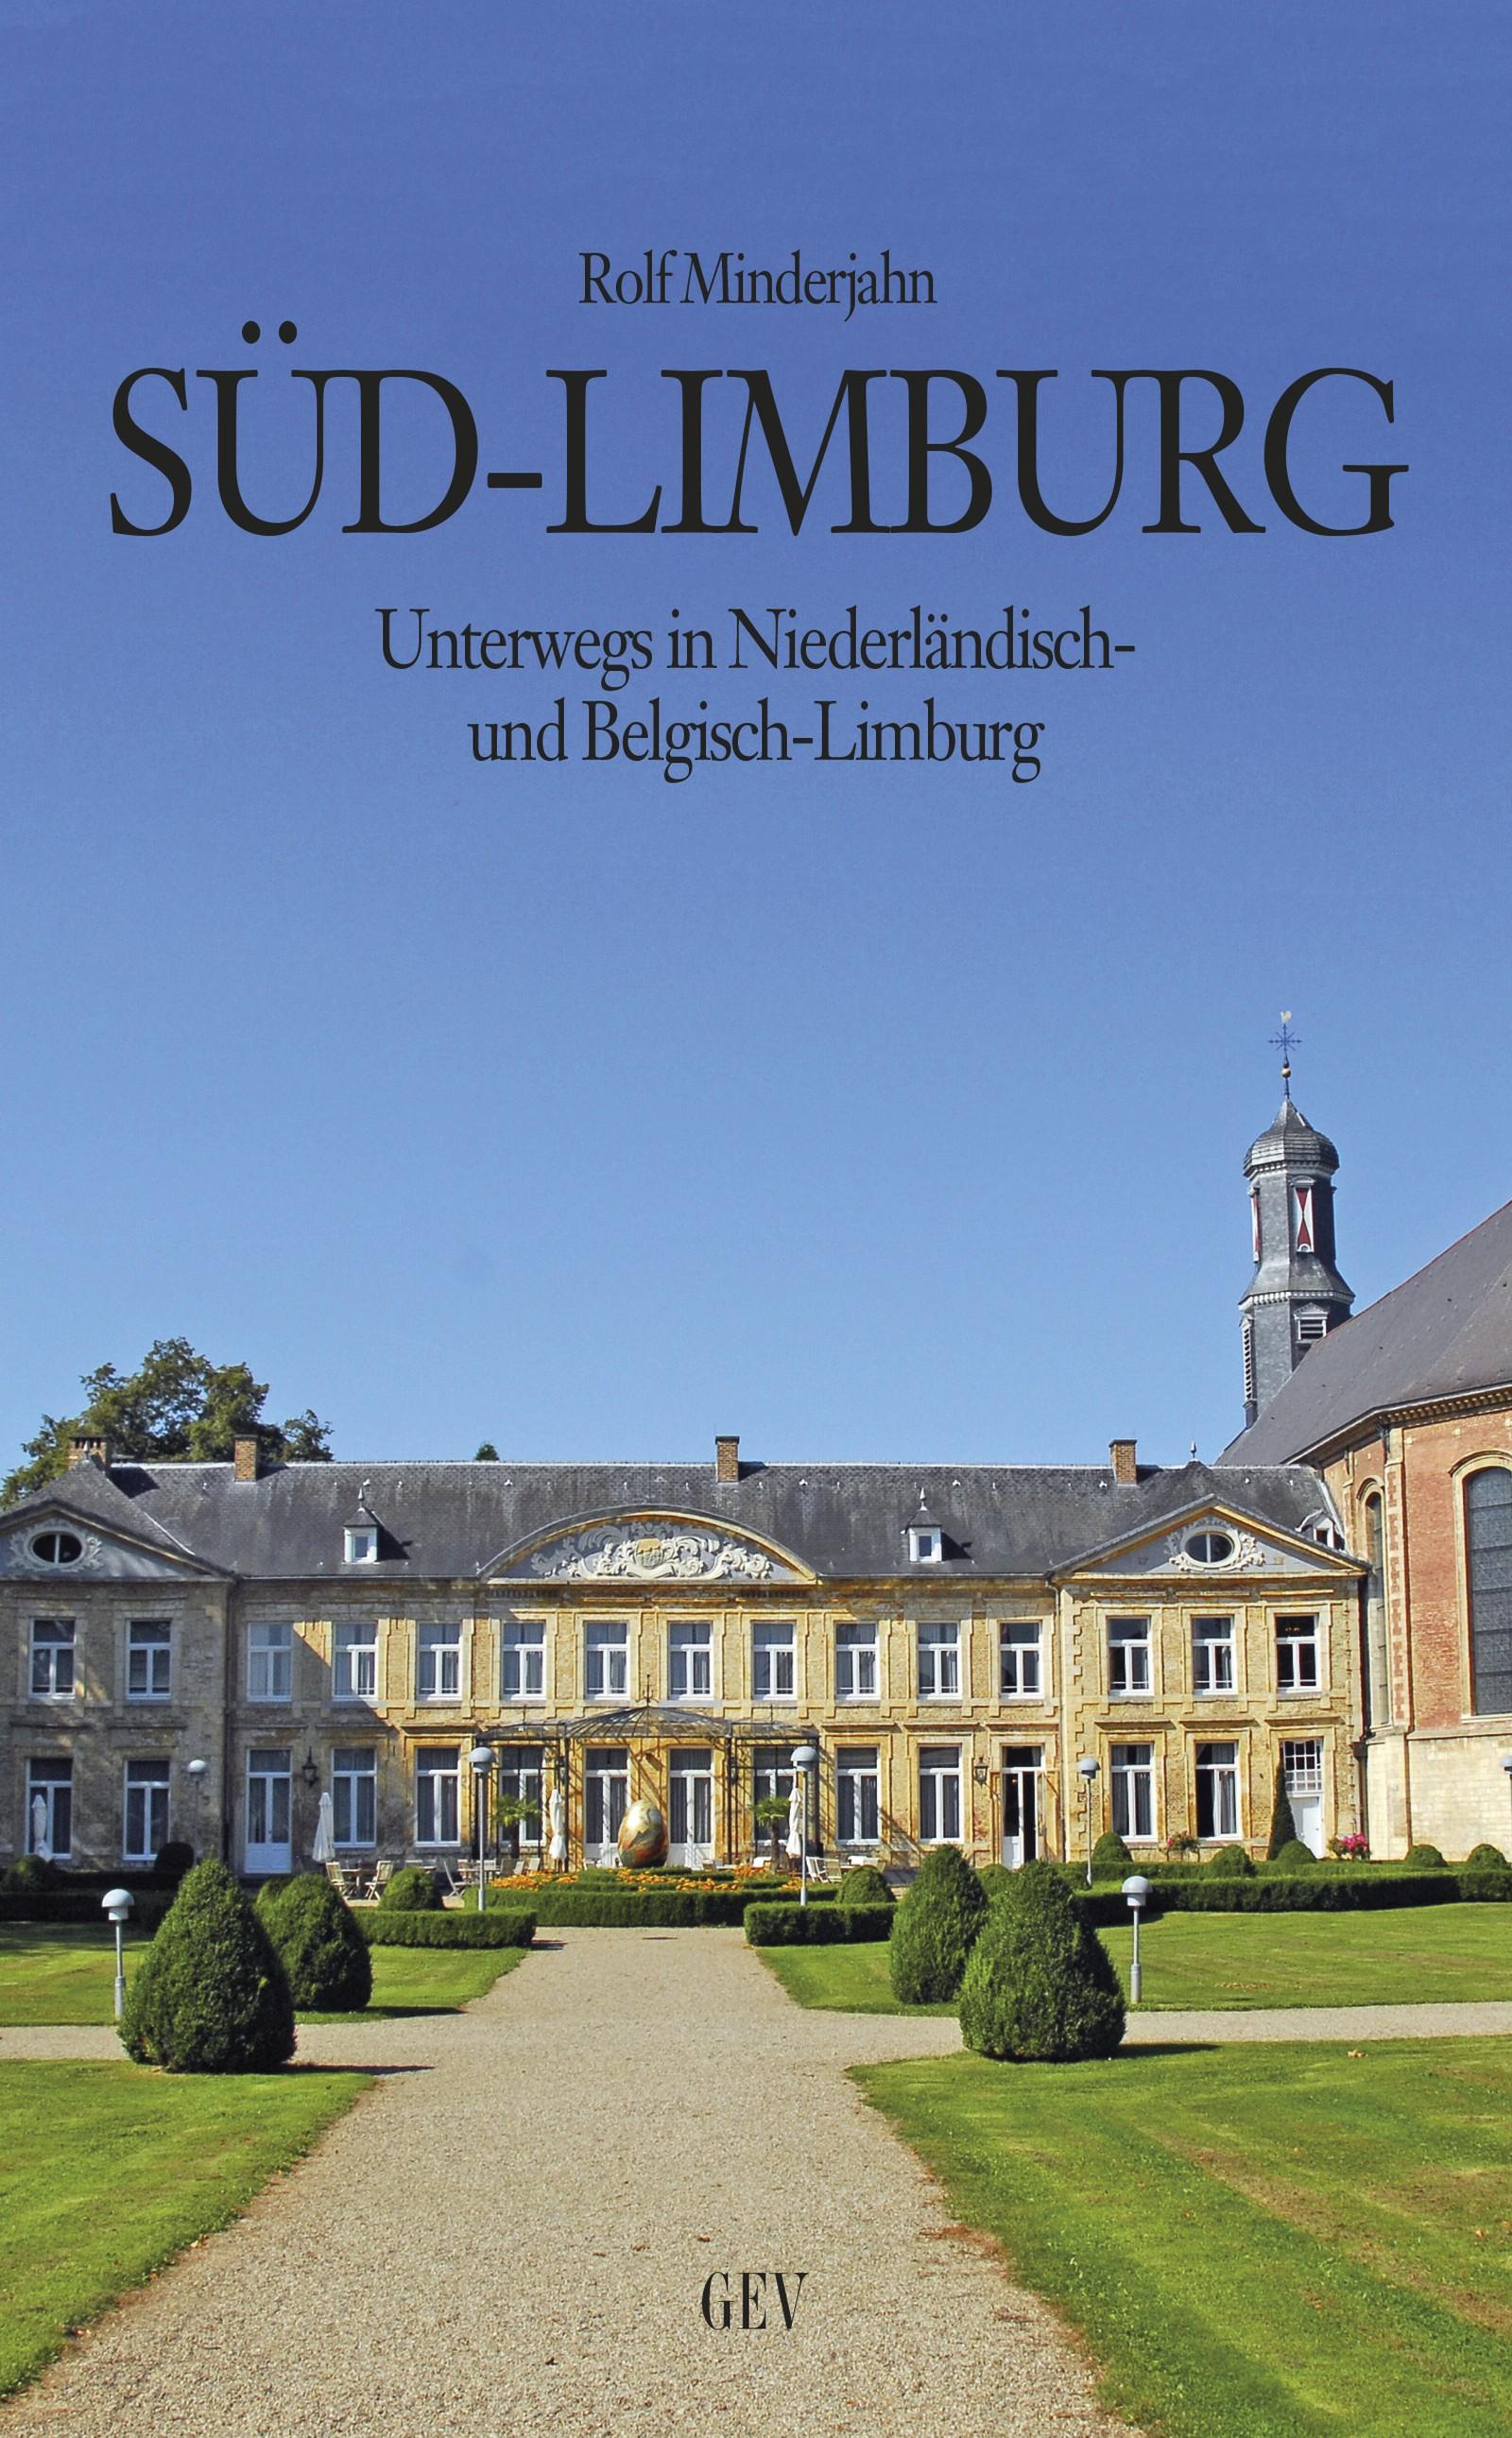 Süd-Limburg